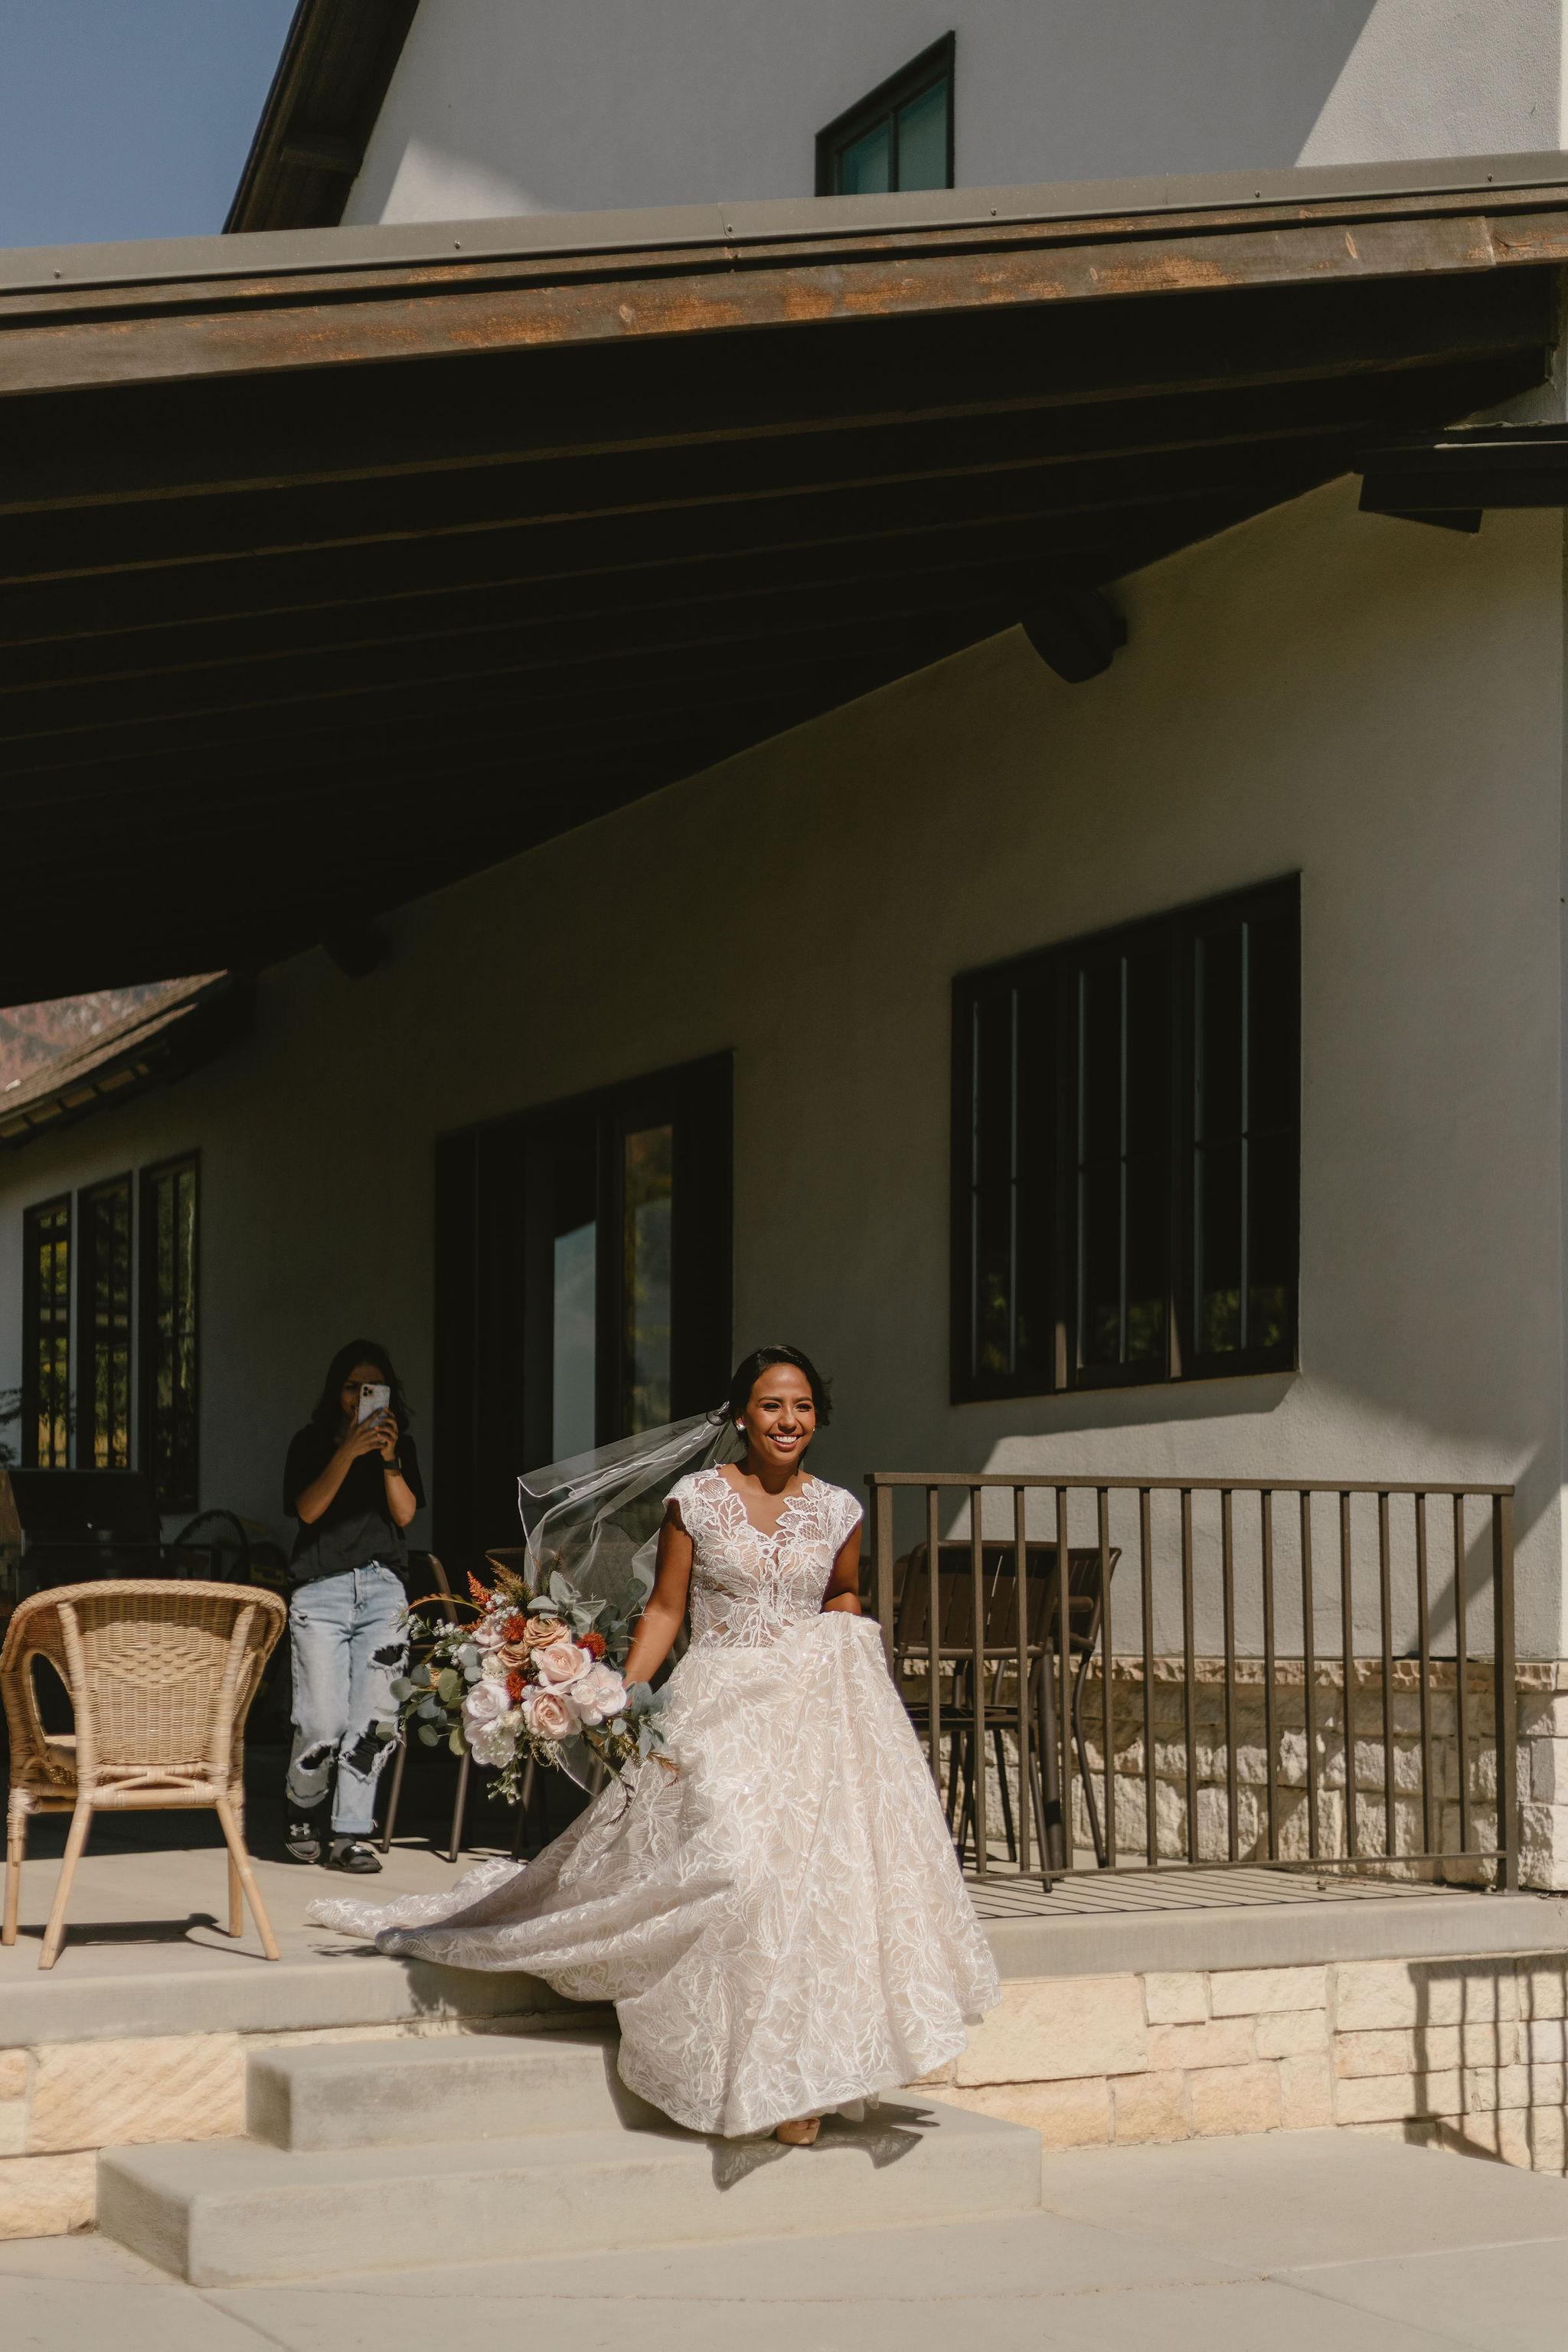 Modest Lace Wedding Dress Ballgown Backyard Summer Wedding Princess Kaiulani Tabernero 2